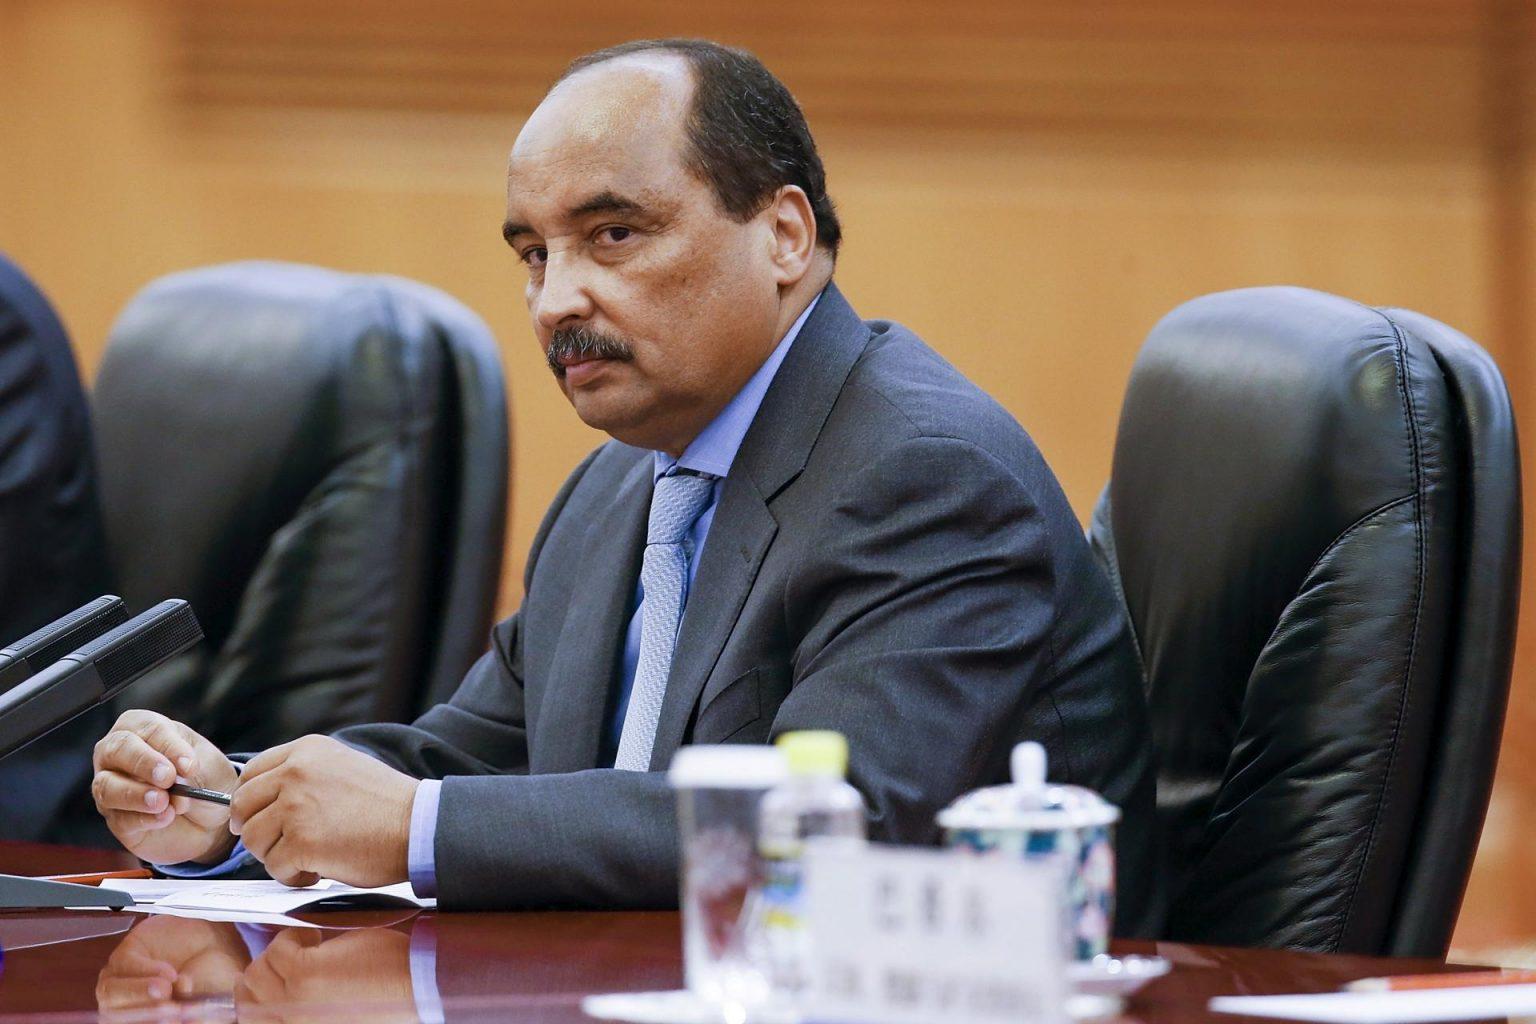 Mauritania frees blogger jailed for 'blasphemy'